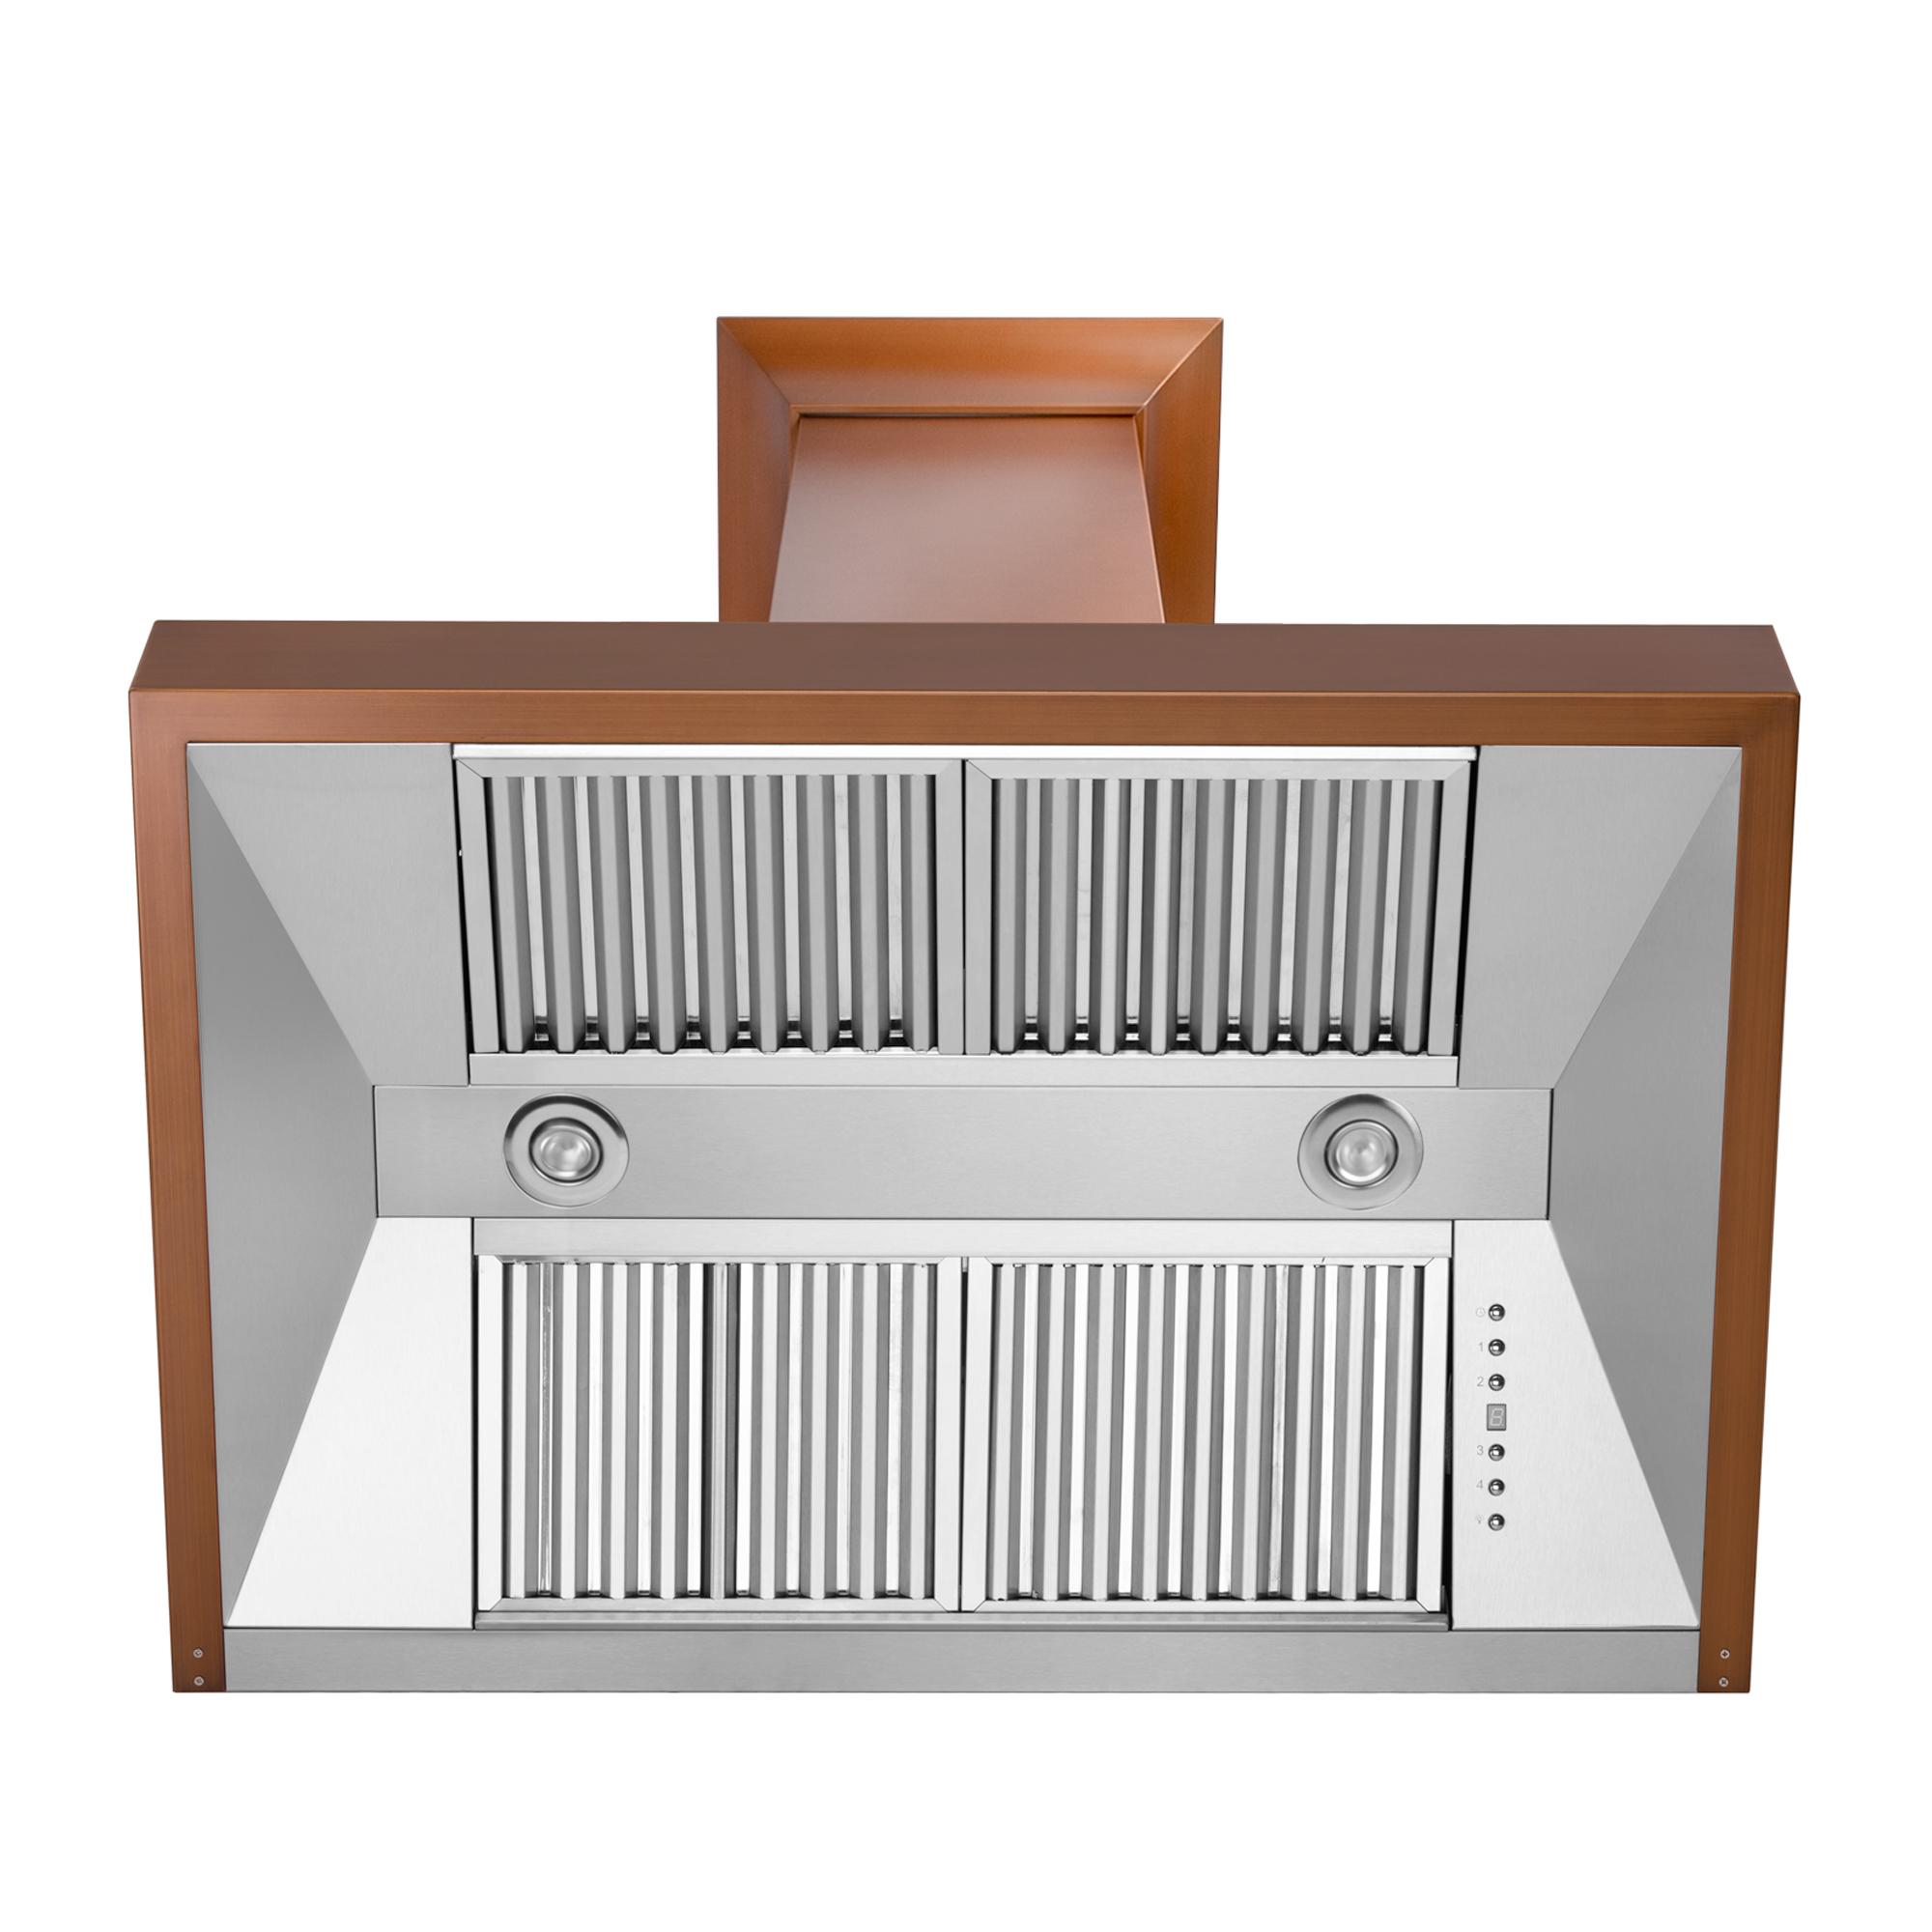 zline-copper-wall-mounted-range-hood-8632C-under.jpg